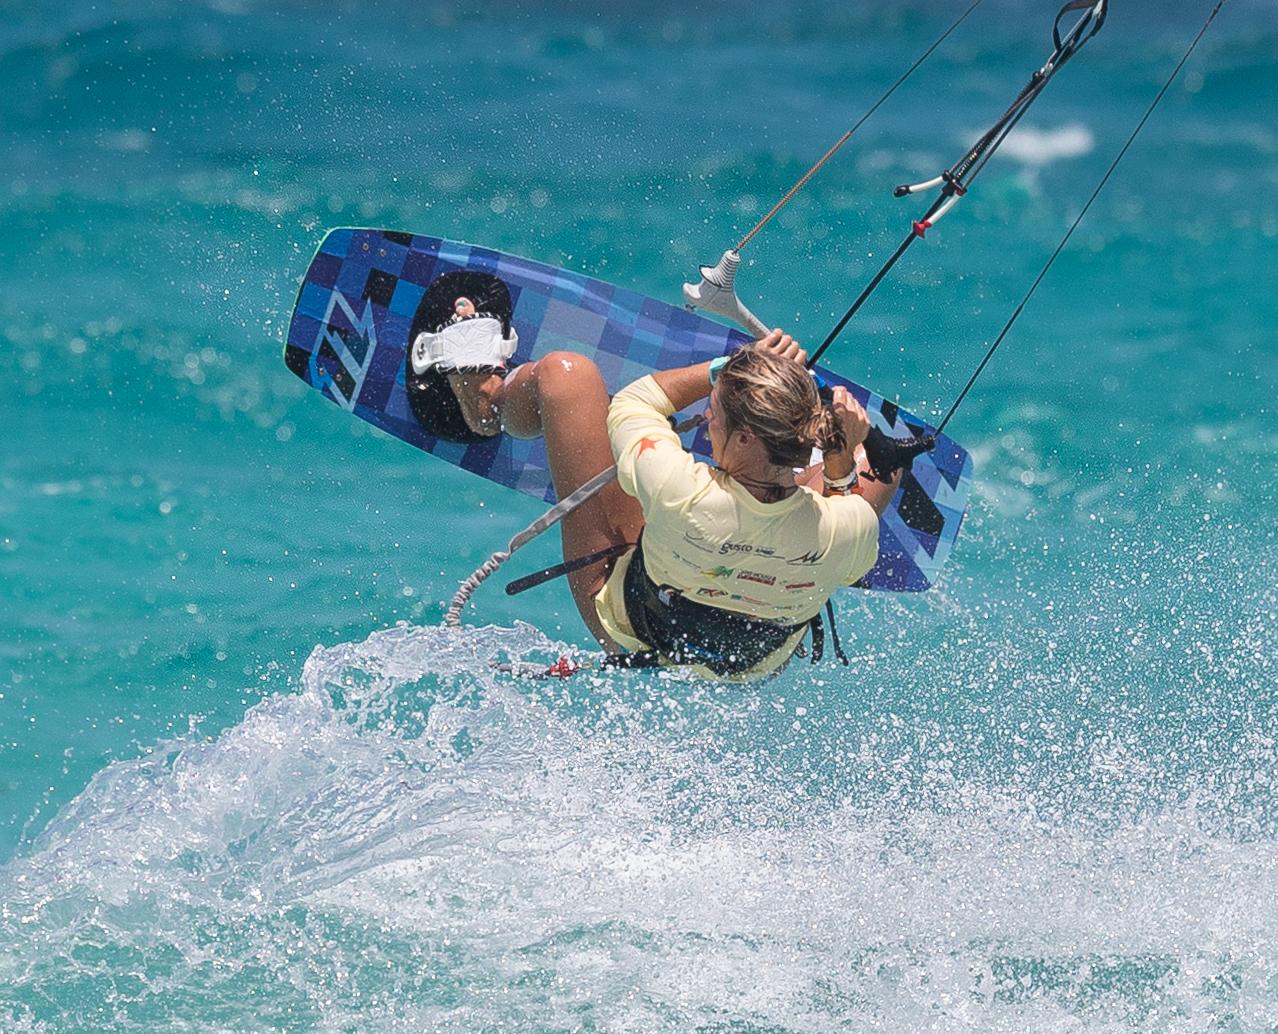 A73Q2250-1.jpg Kitesurfing Pictures